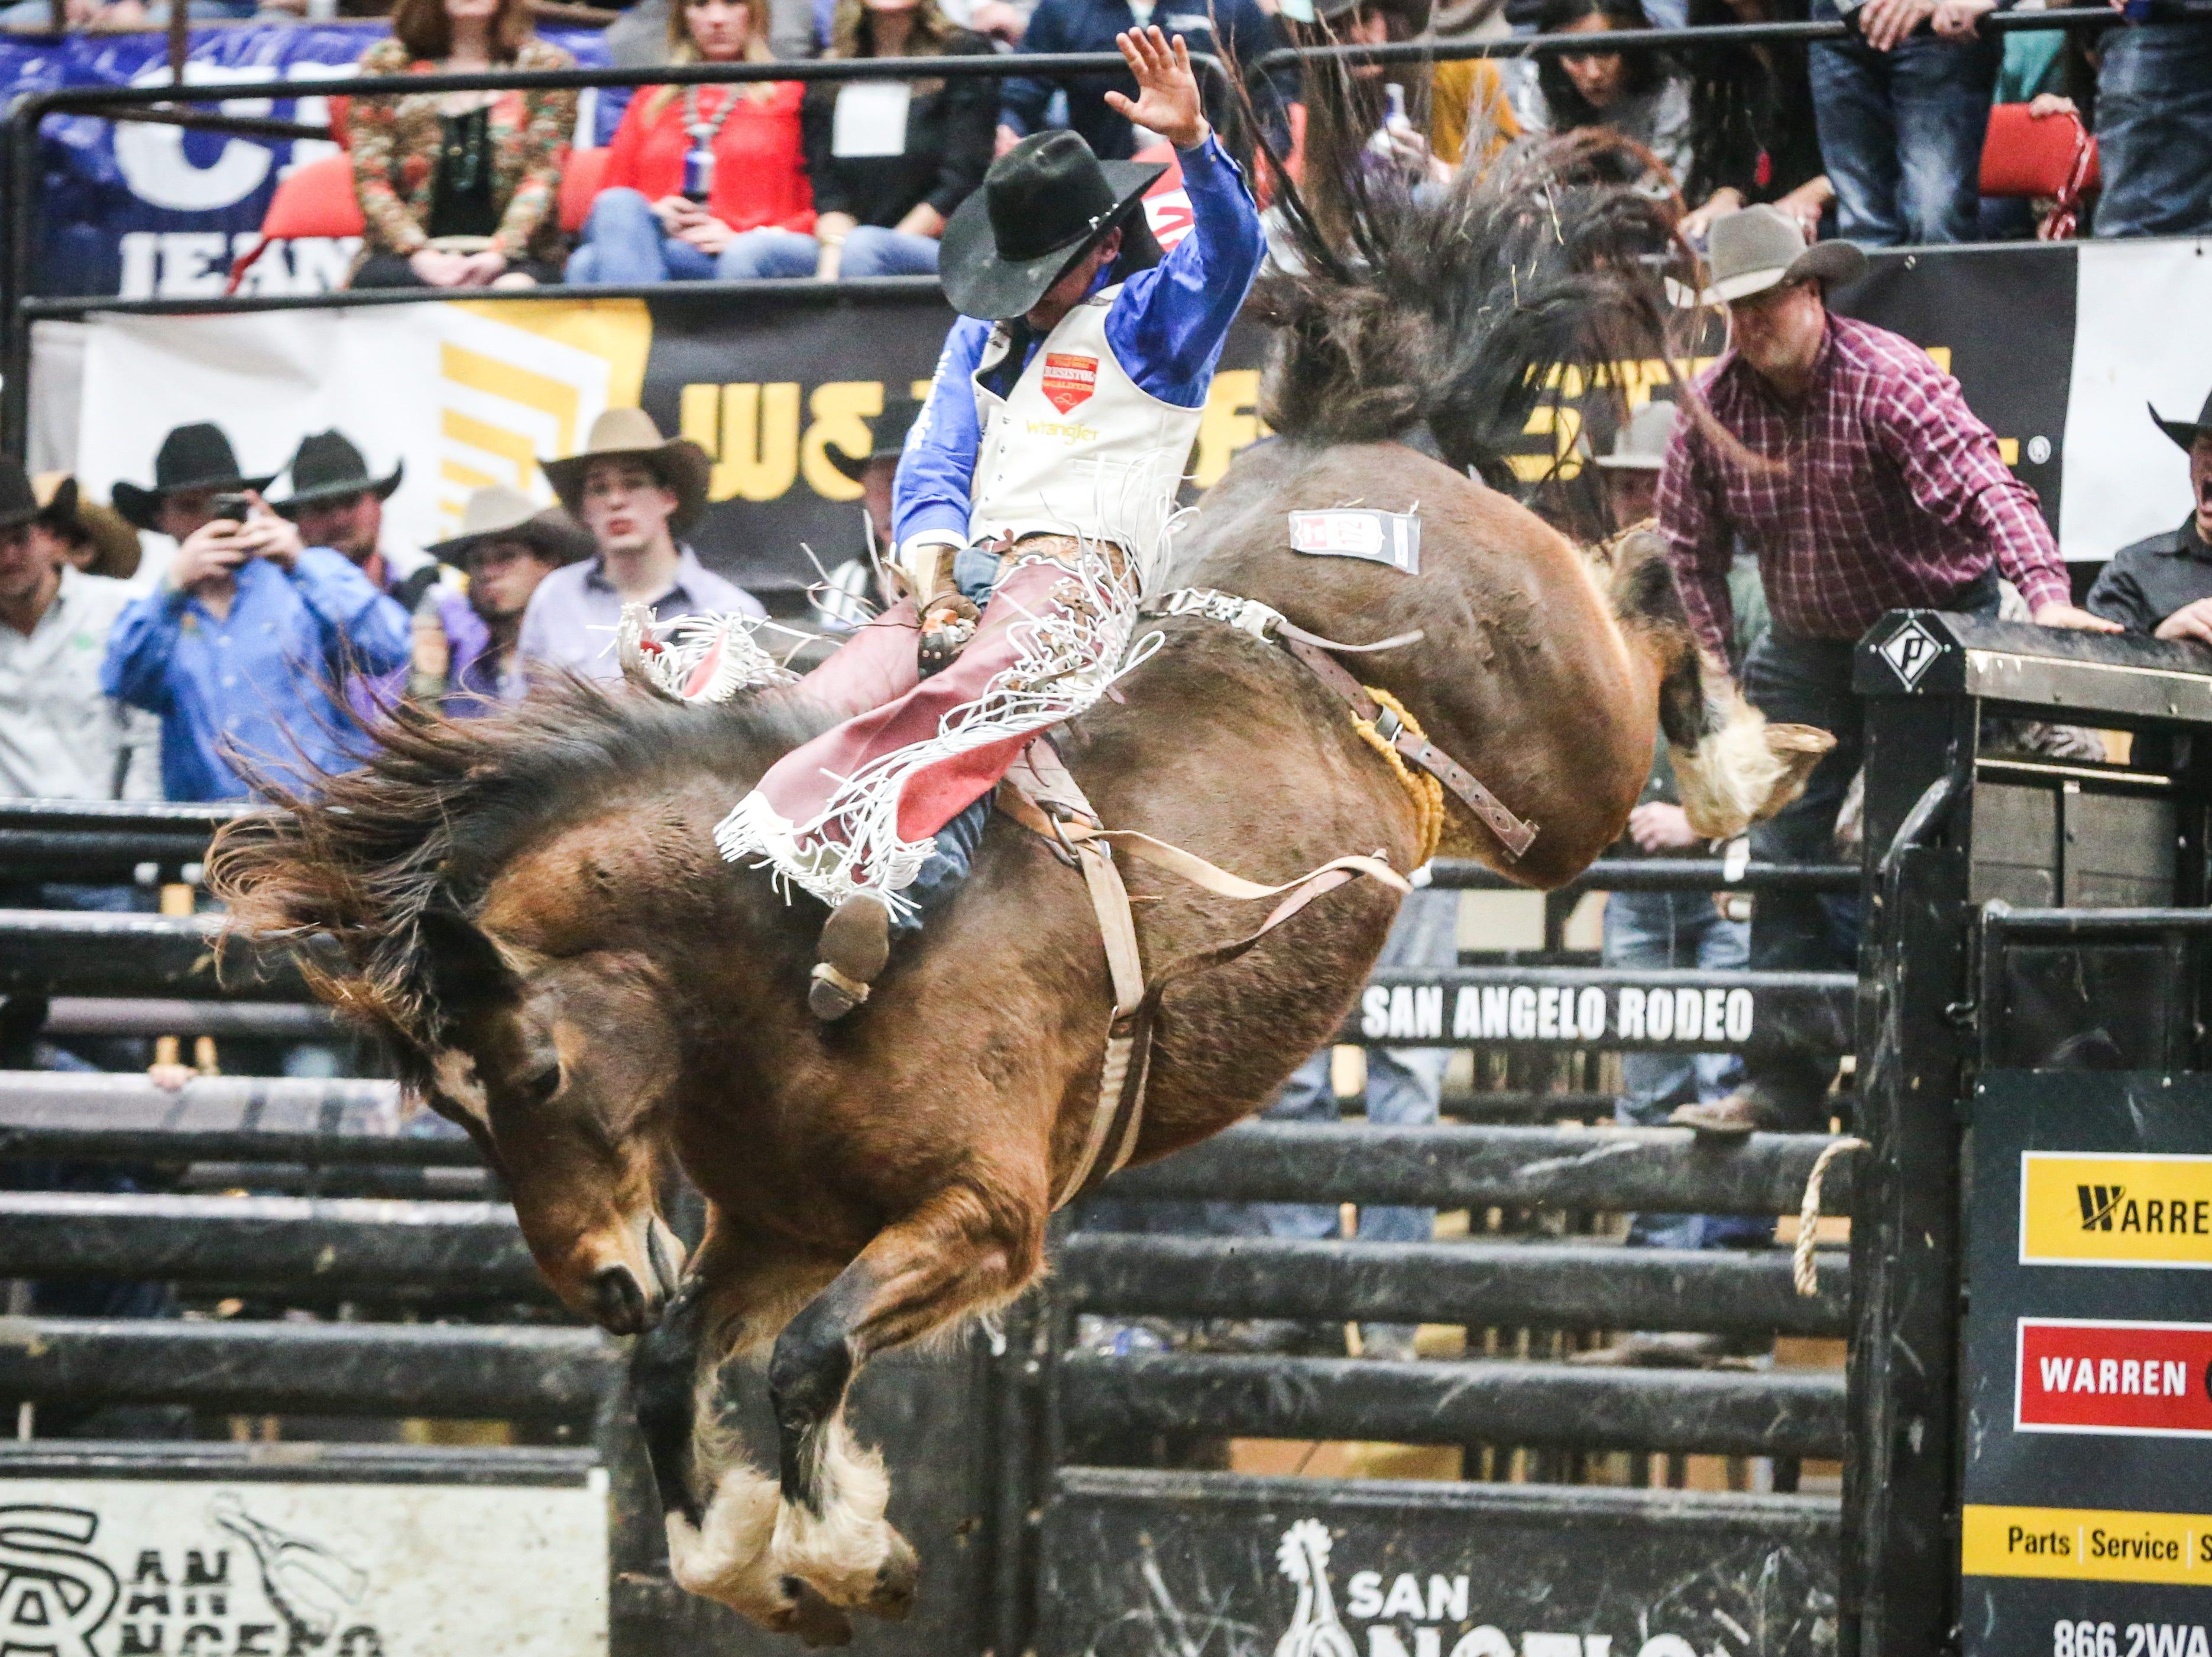 Clayton Biglow rides bareback on Top Notch during Cinch Chute Out Saturday, Feb. 16, 2019, at Foster Communications Coliseum. Biglow was the bareback riding champion.